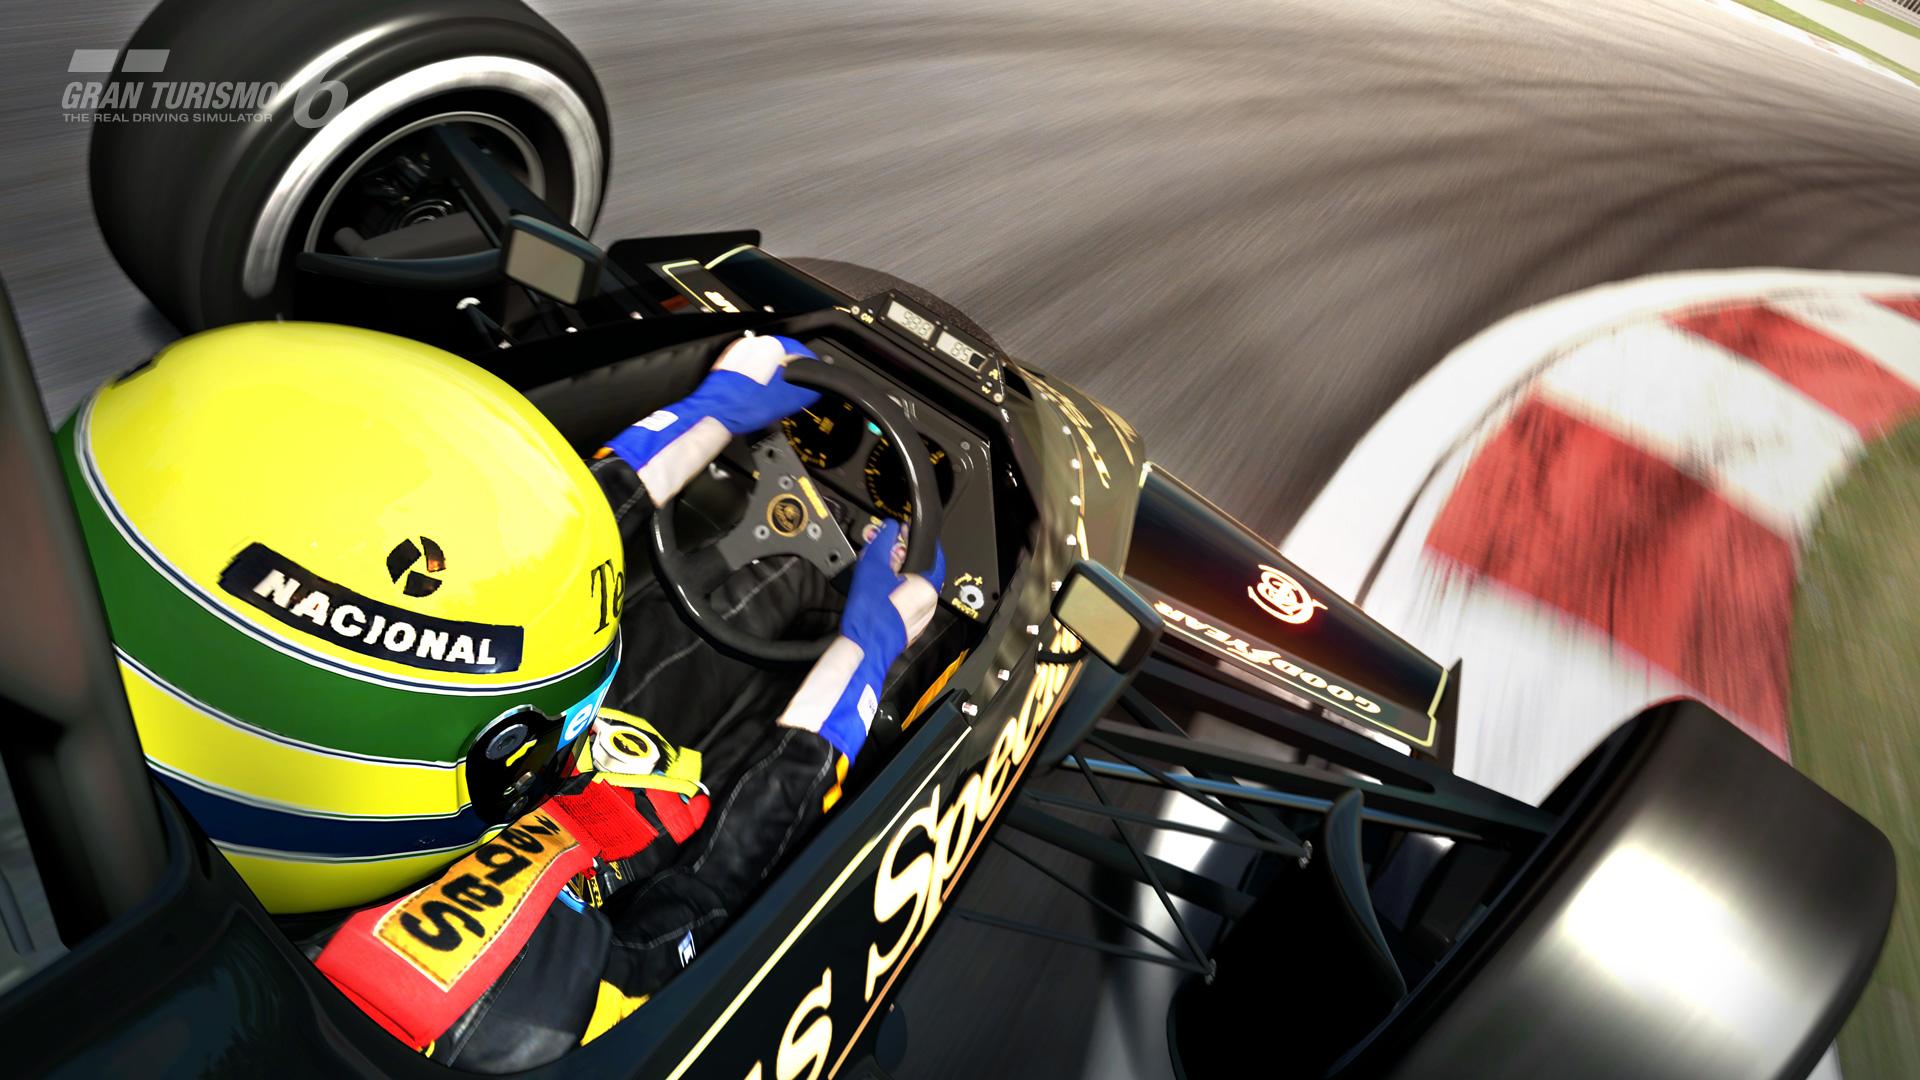 Gran Turismo 6: Videón Ayrton Senna és a legendás Lotus 97T